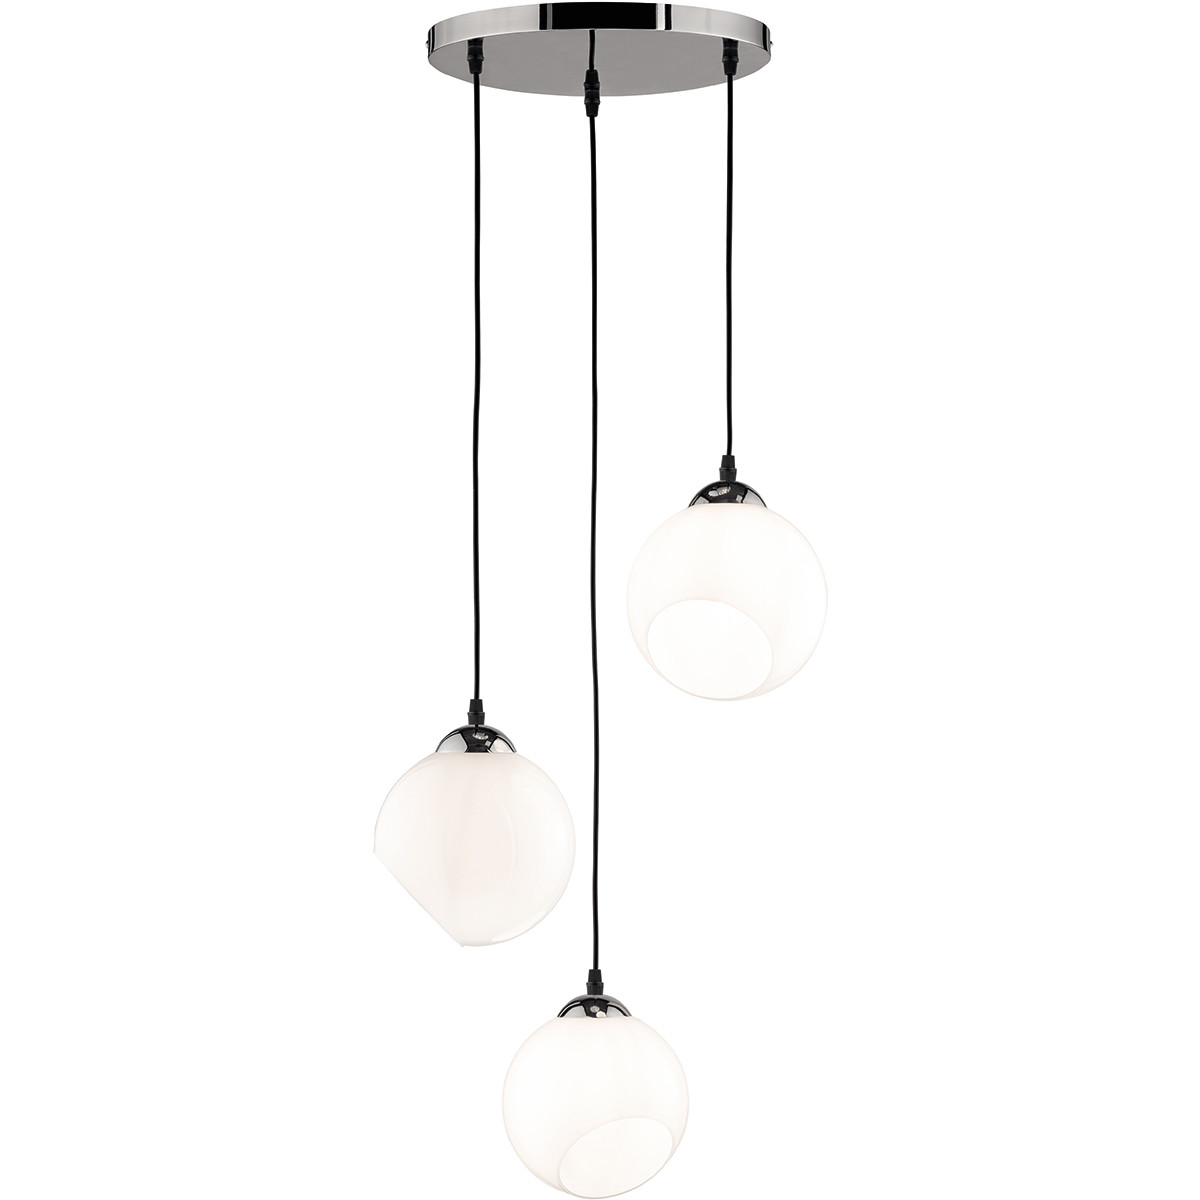 LED Hanglamp - Trion Klino - E27 Fitting - 3-lichts - Rond - Mat Chroom - Aluminium